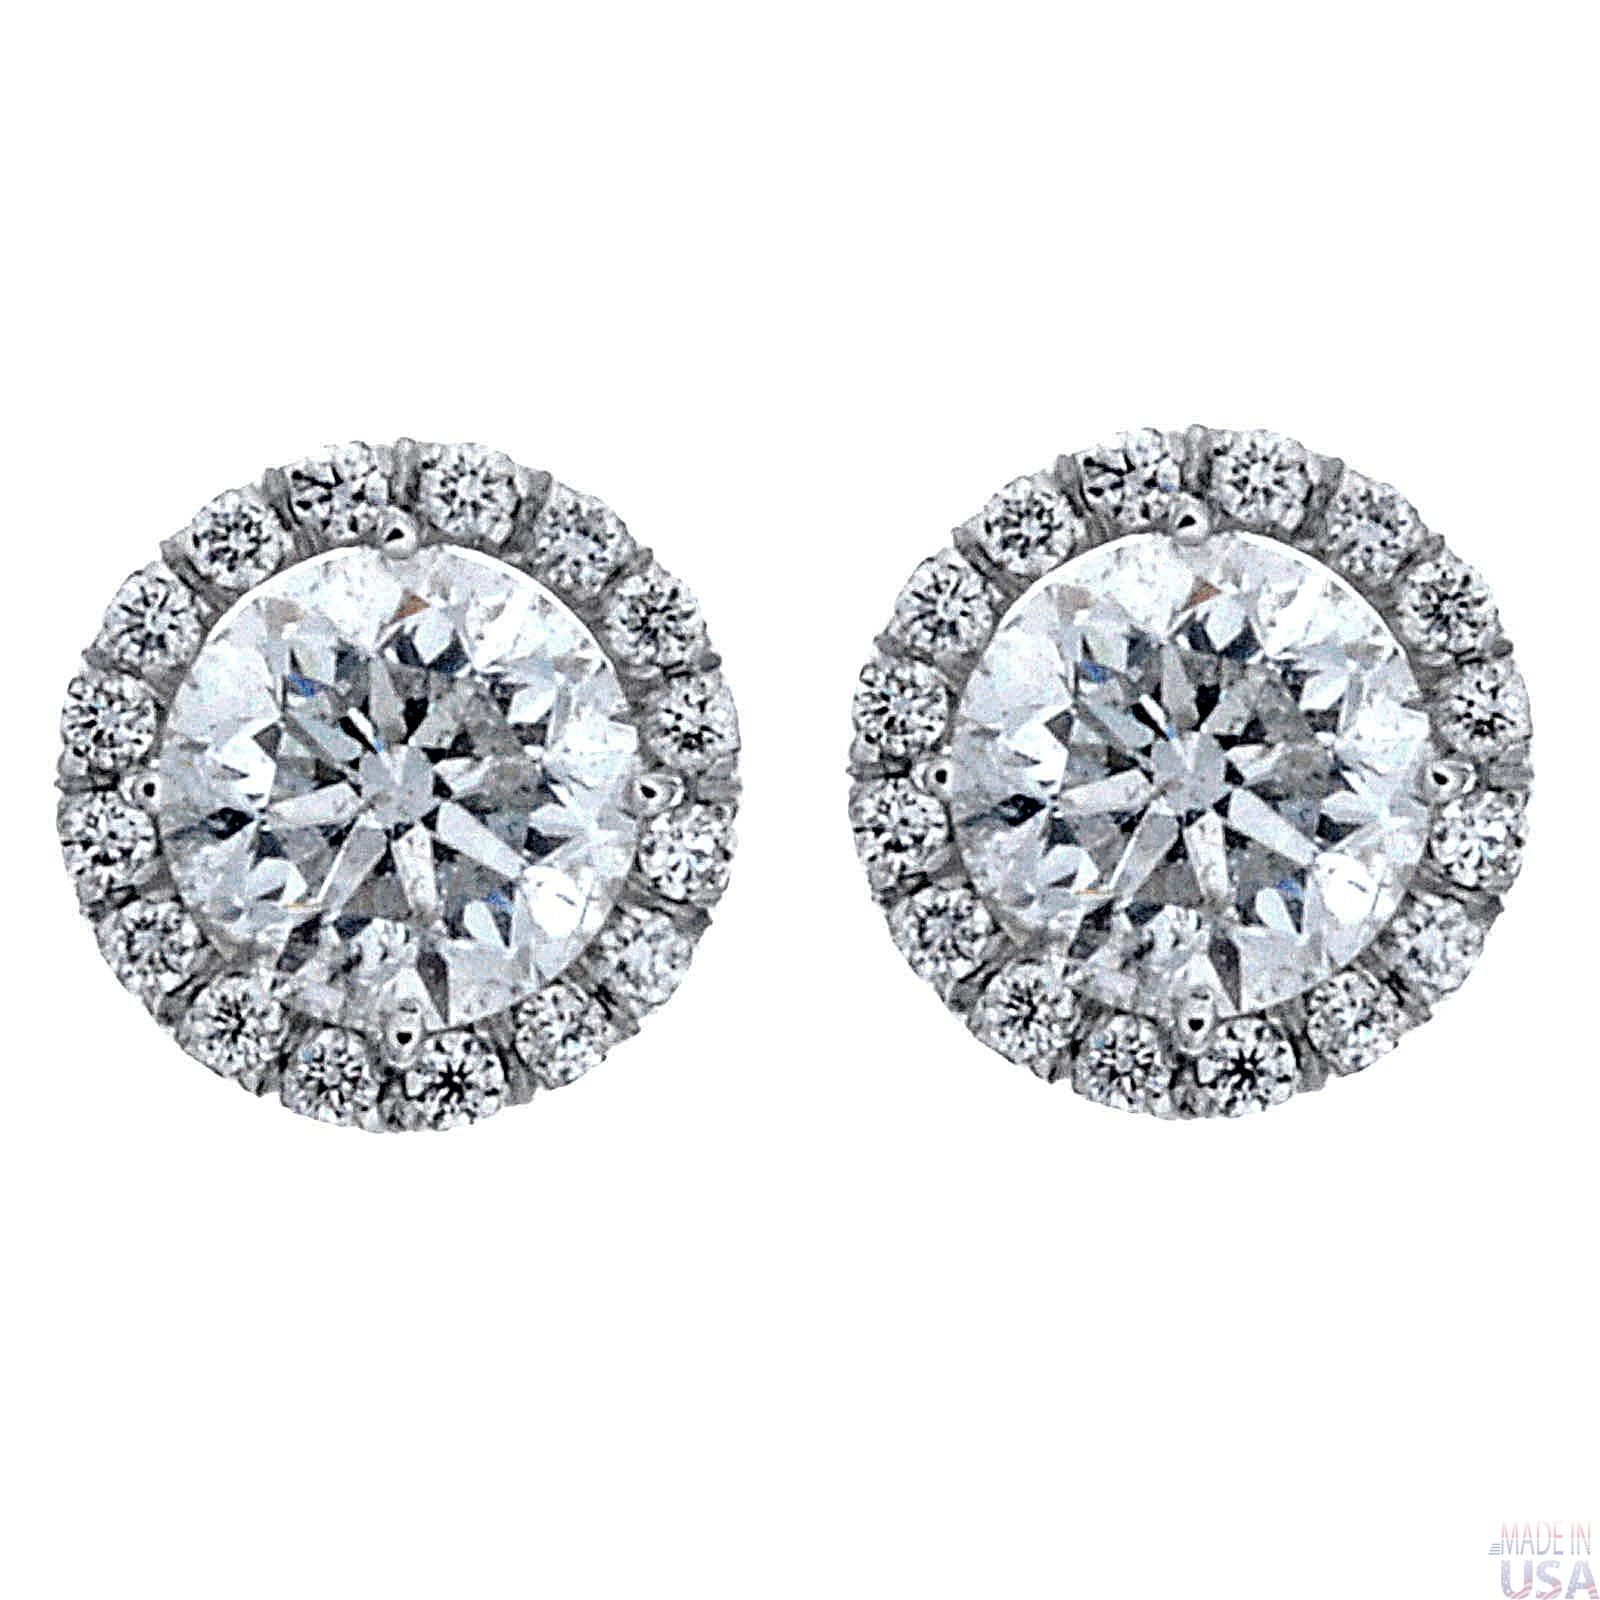 2 00ct Round Brilliant Cut Diamond Micropavé Stud Earrings